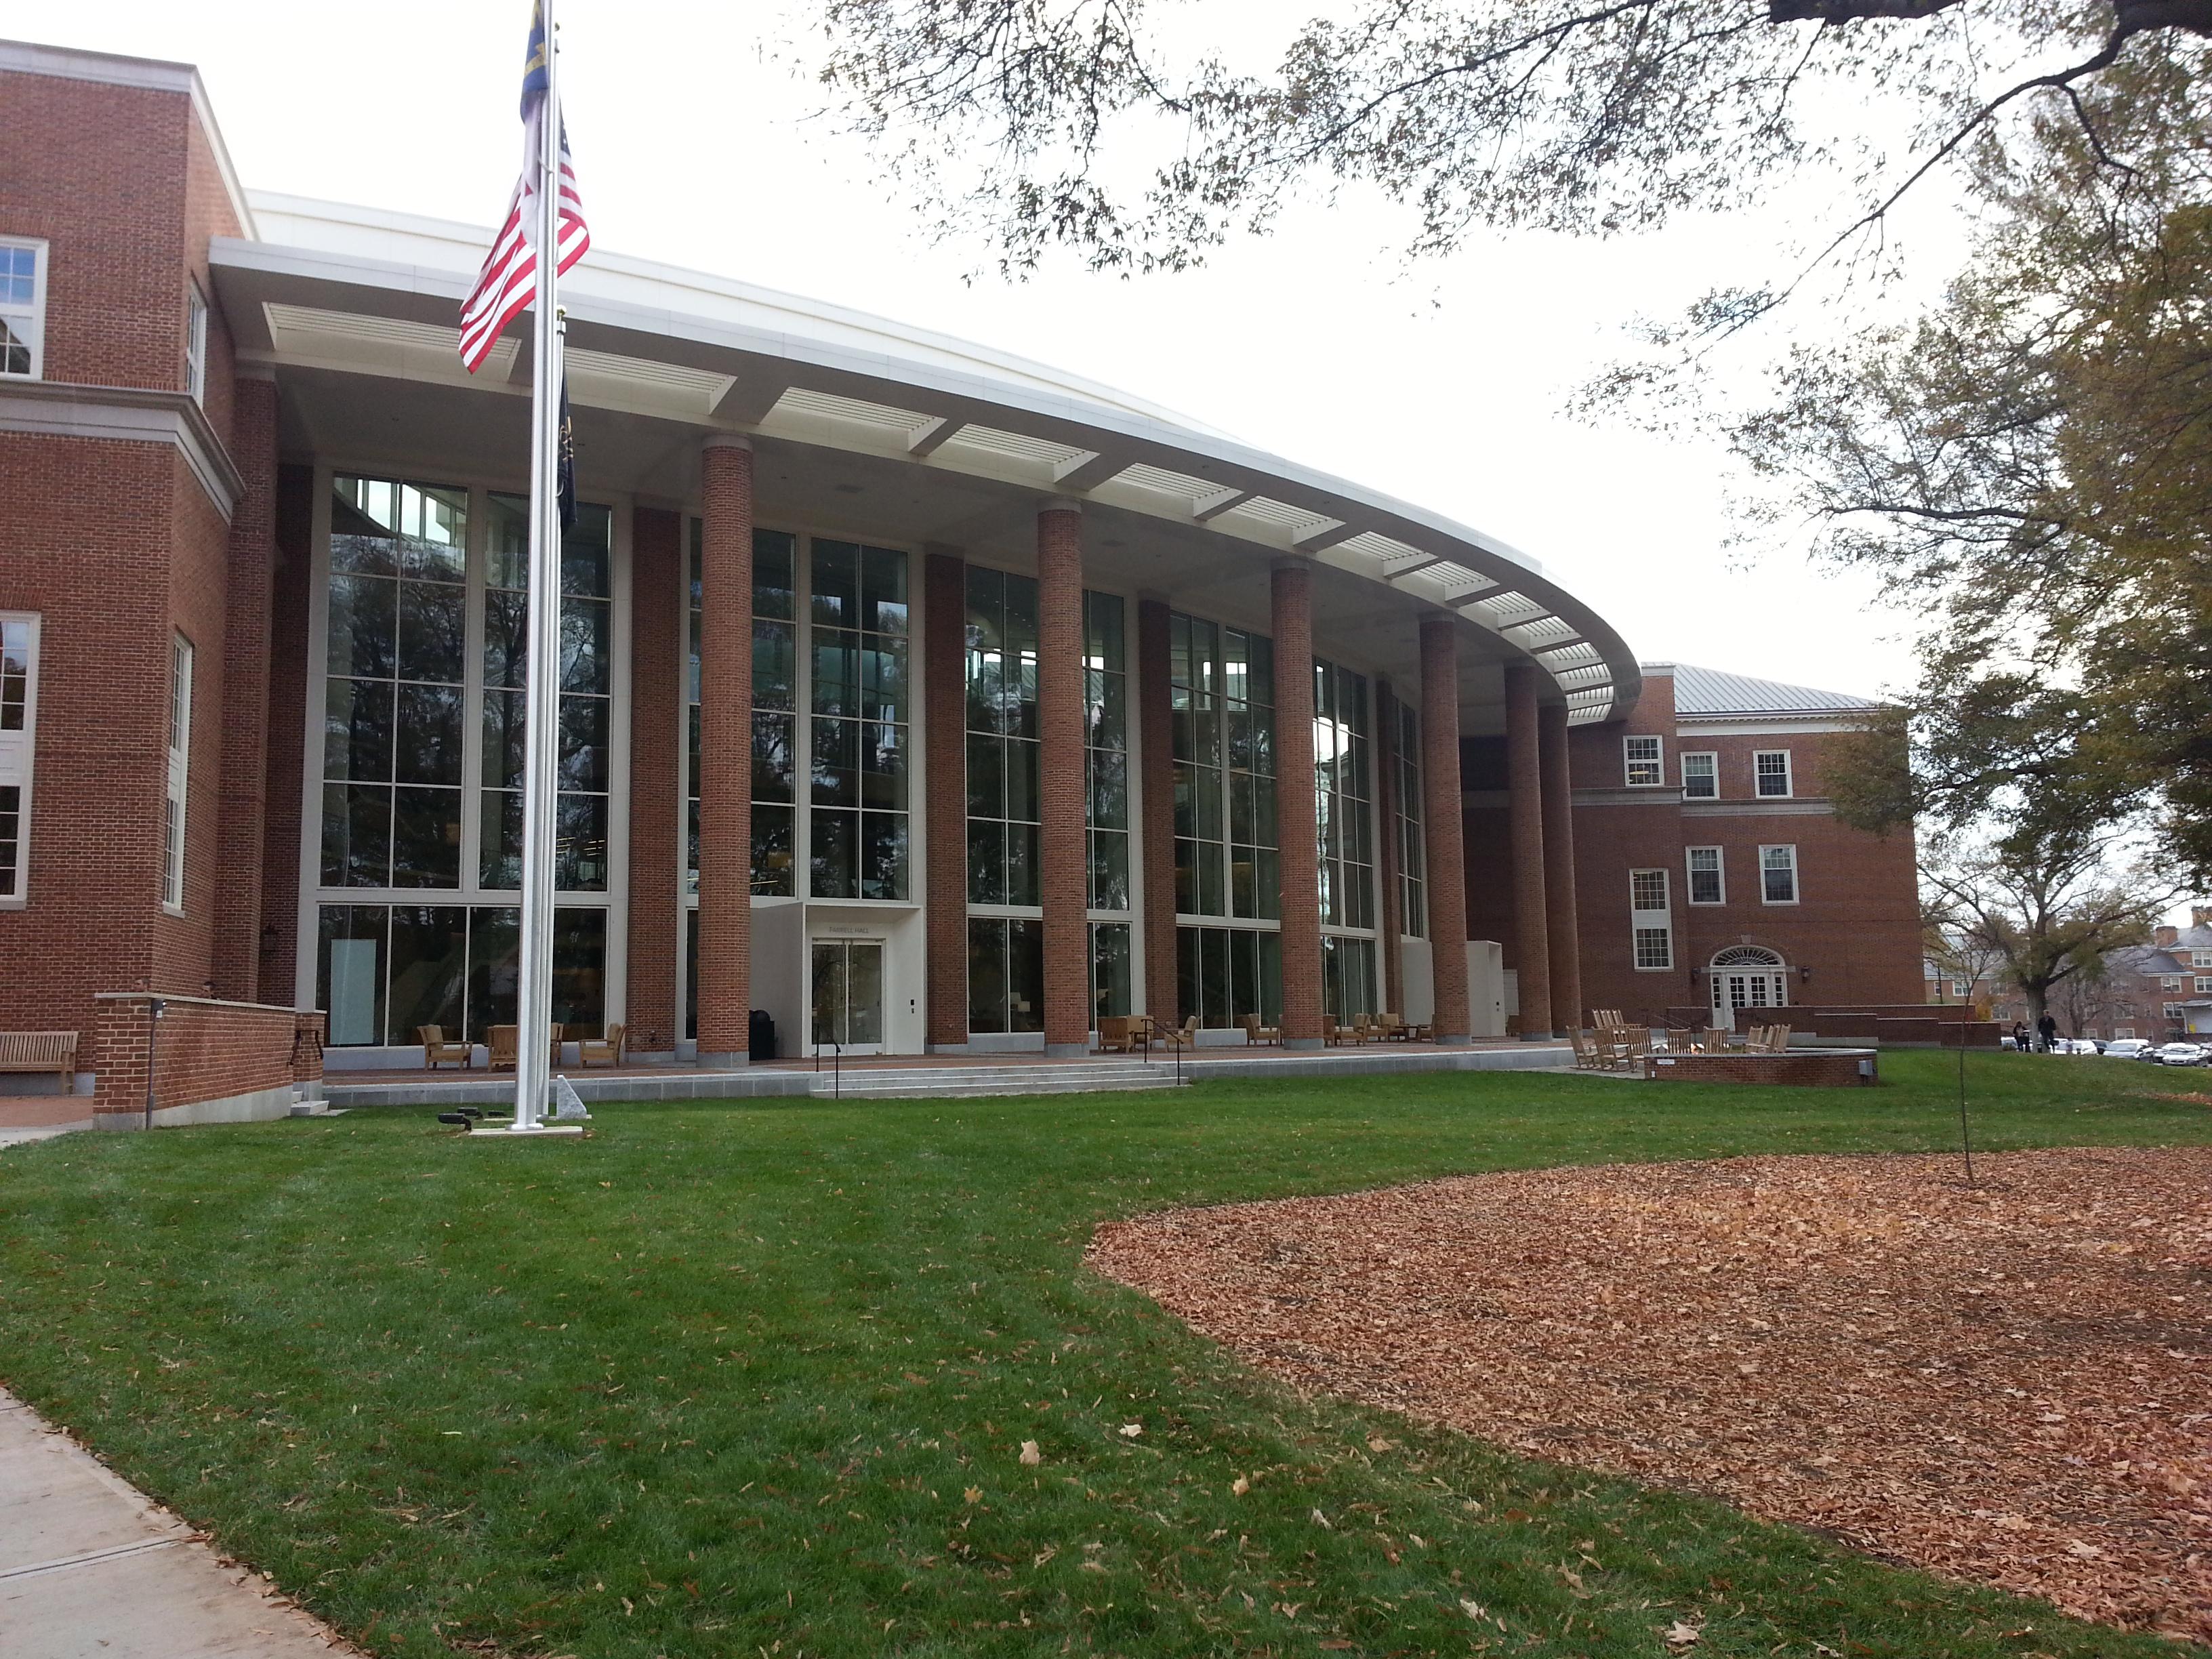 Farrell Hall Recruiter Entrance